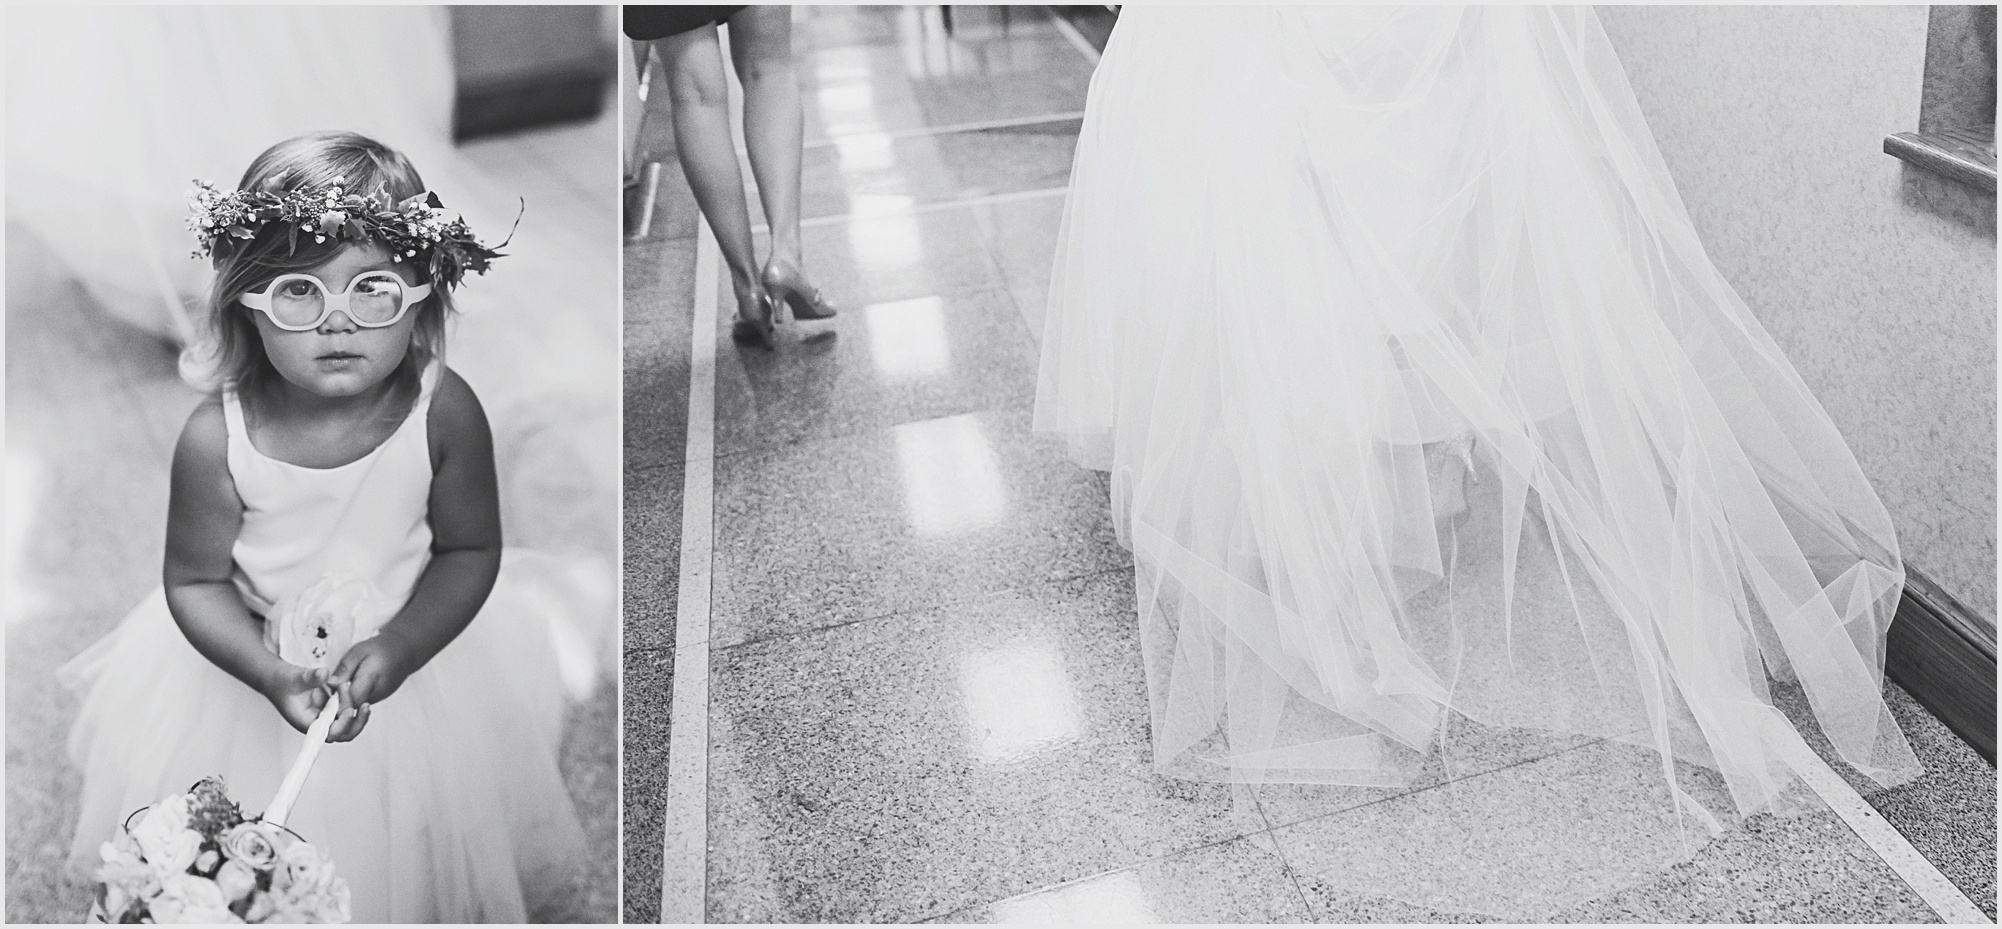 maura_david_james_j_hill_wedding_lucas_botz_photography_011.jpg